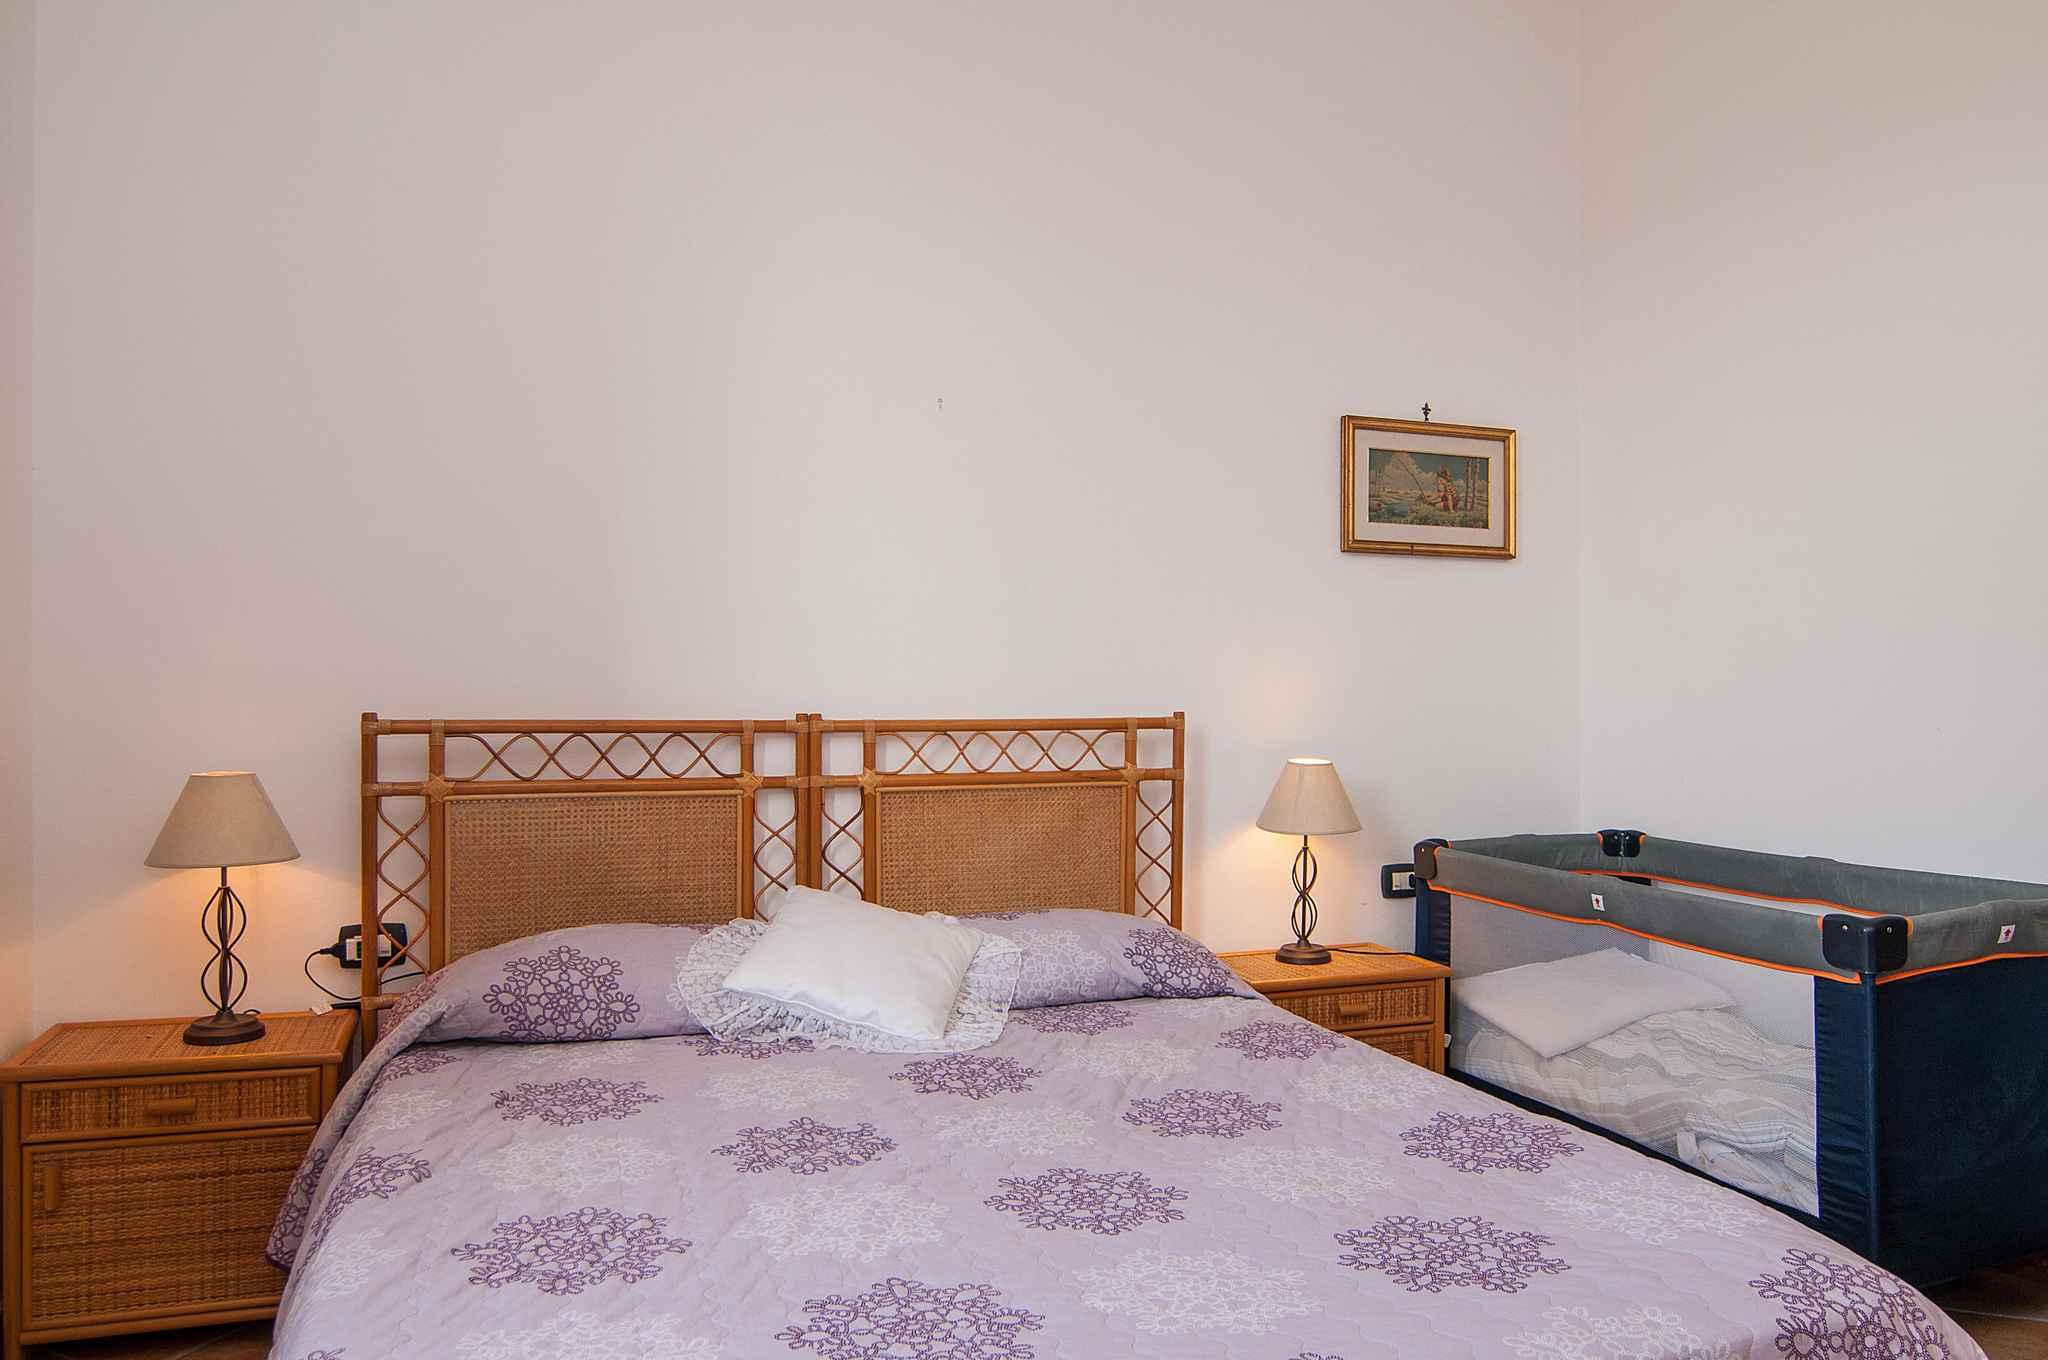 Maison de vacances mit Blick auf Zitronengarten (317534), Lido di Noto, Siracusa, Sicile, Italie, image 25